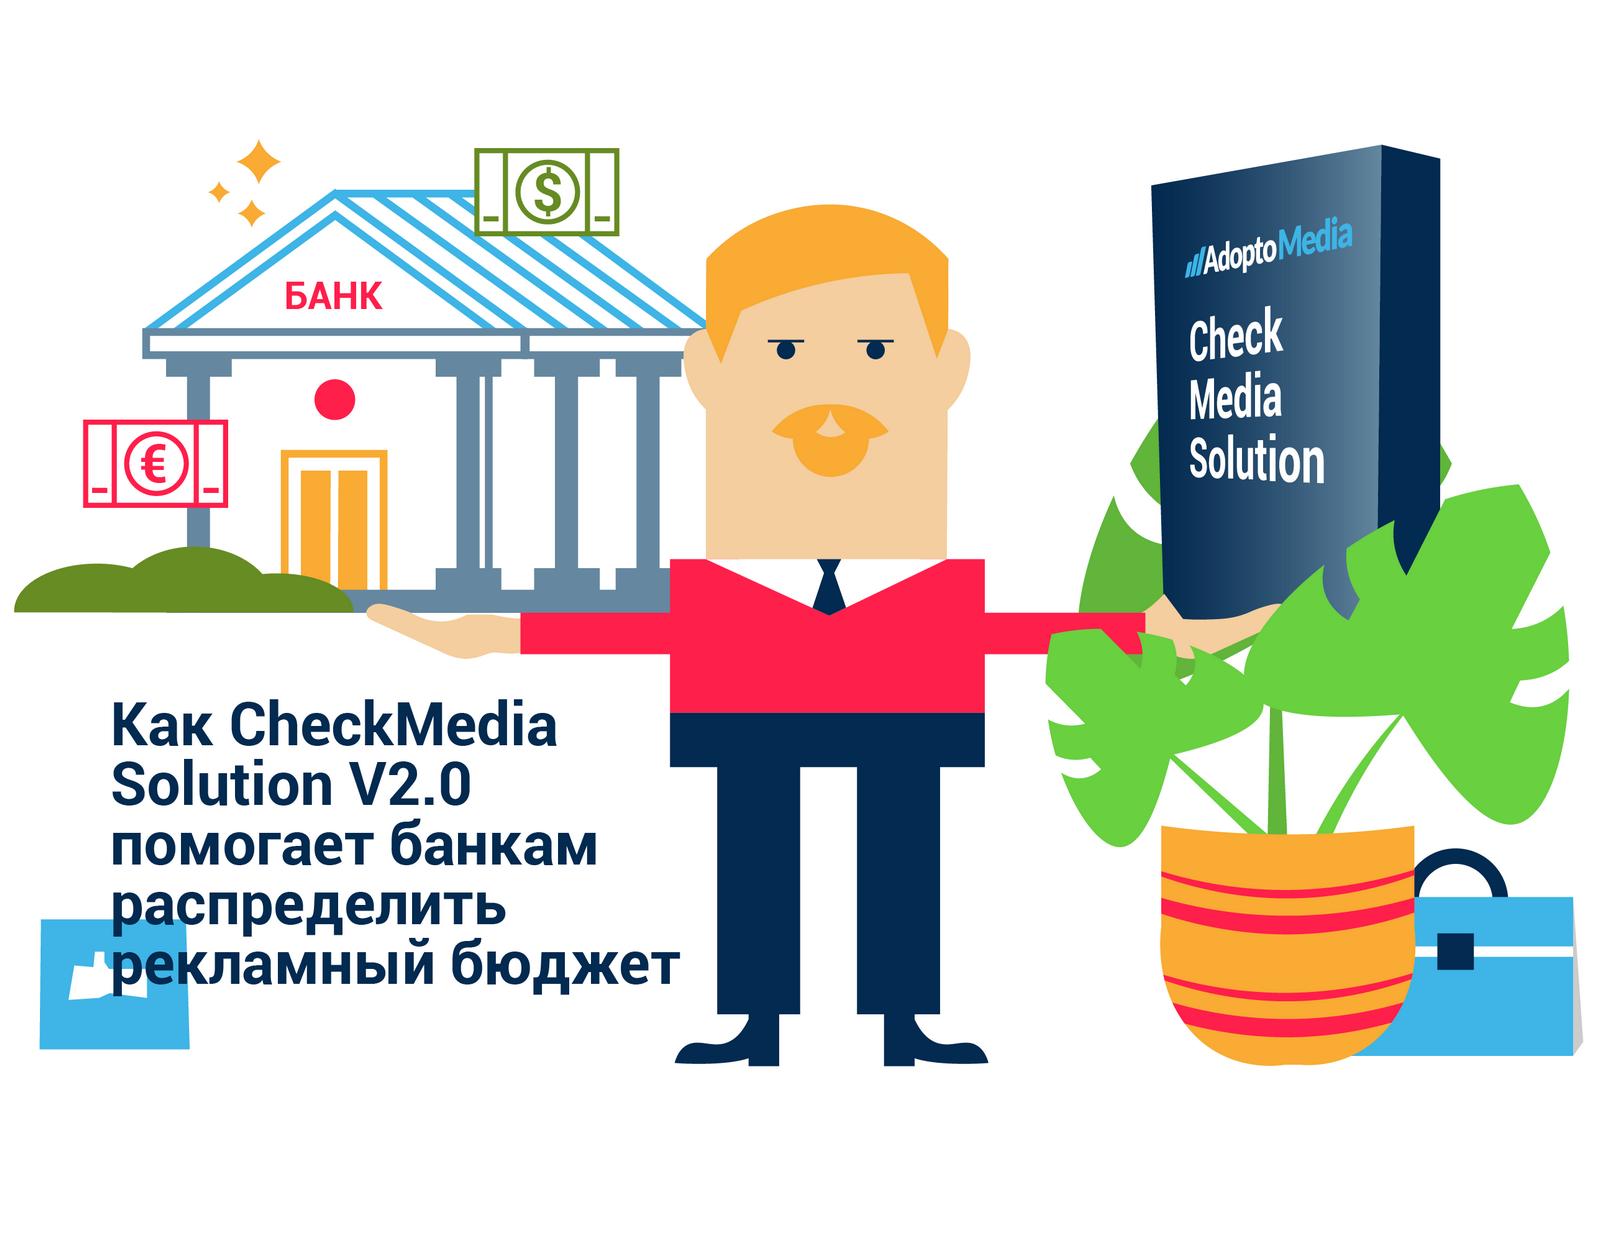 AdoptoMedia, CheckMedia Solution, медиамикс банка, оптимизация рекламного бюджета, распределение рекламного бюджета